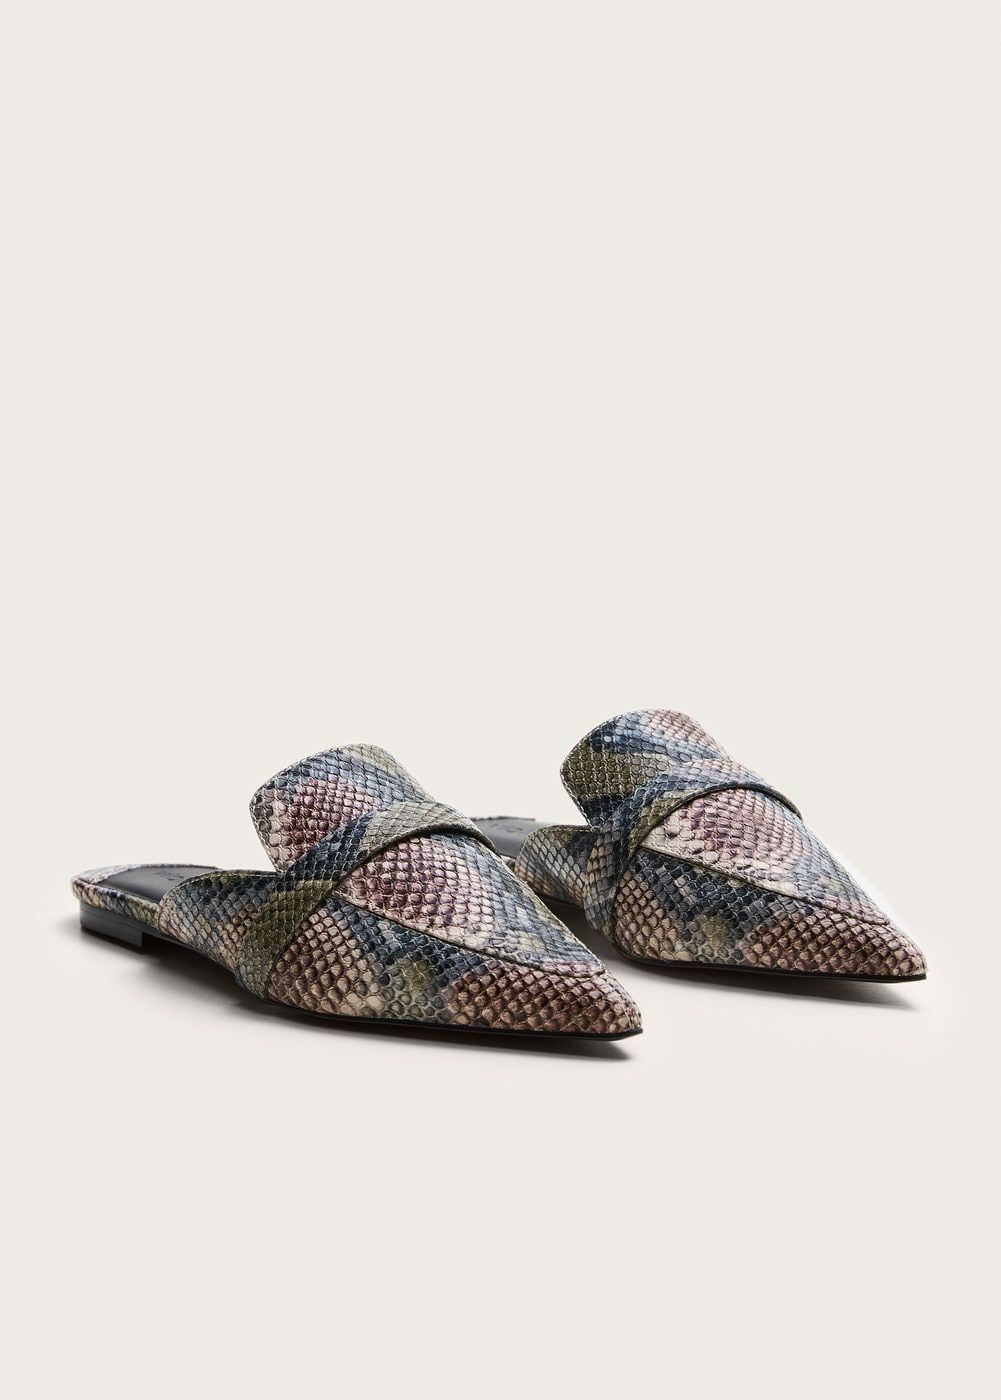 665f2f52c Snake-effect mules - Plus sizes v roku 2019 | obuv | Shoes, Snake a ...